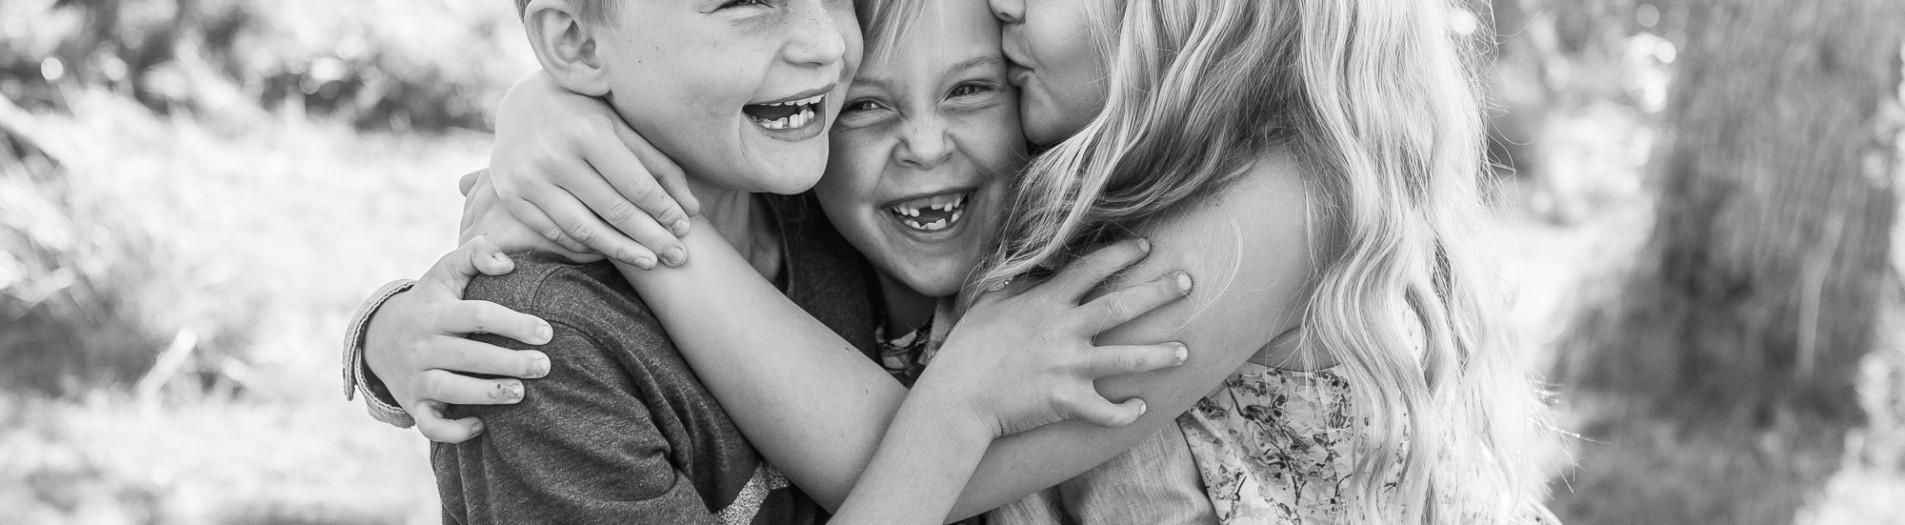 Familjen Hartlow - familjefotografering